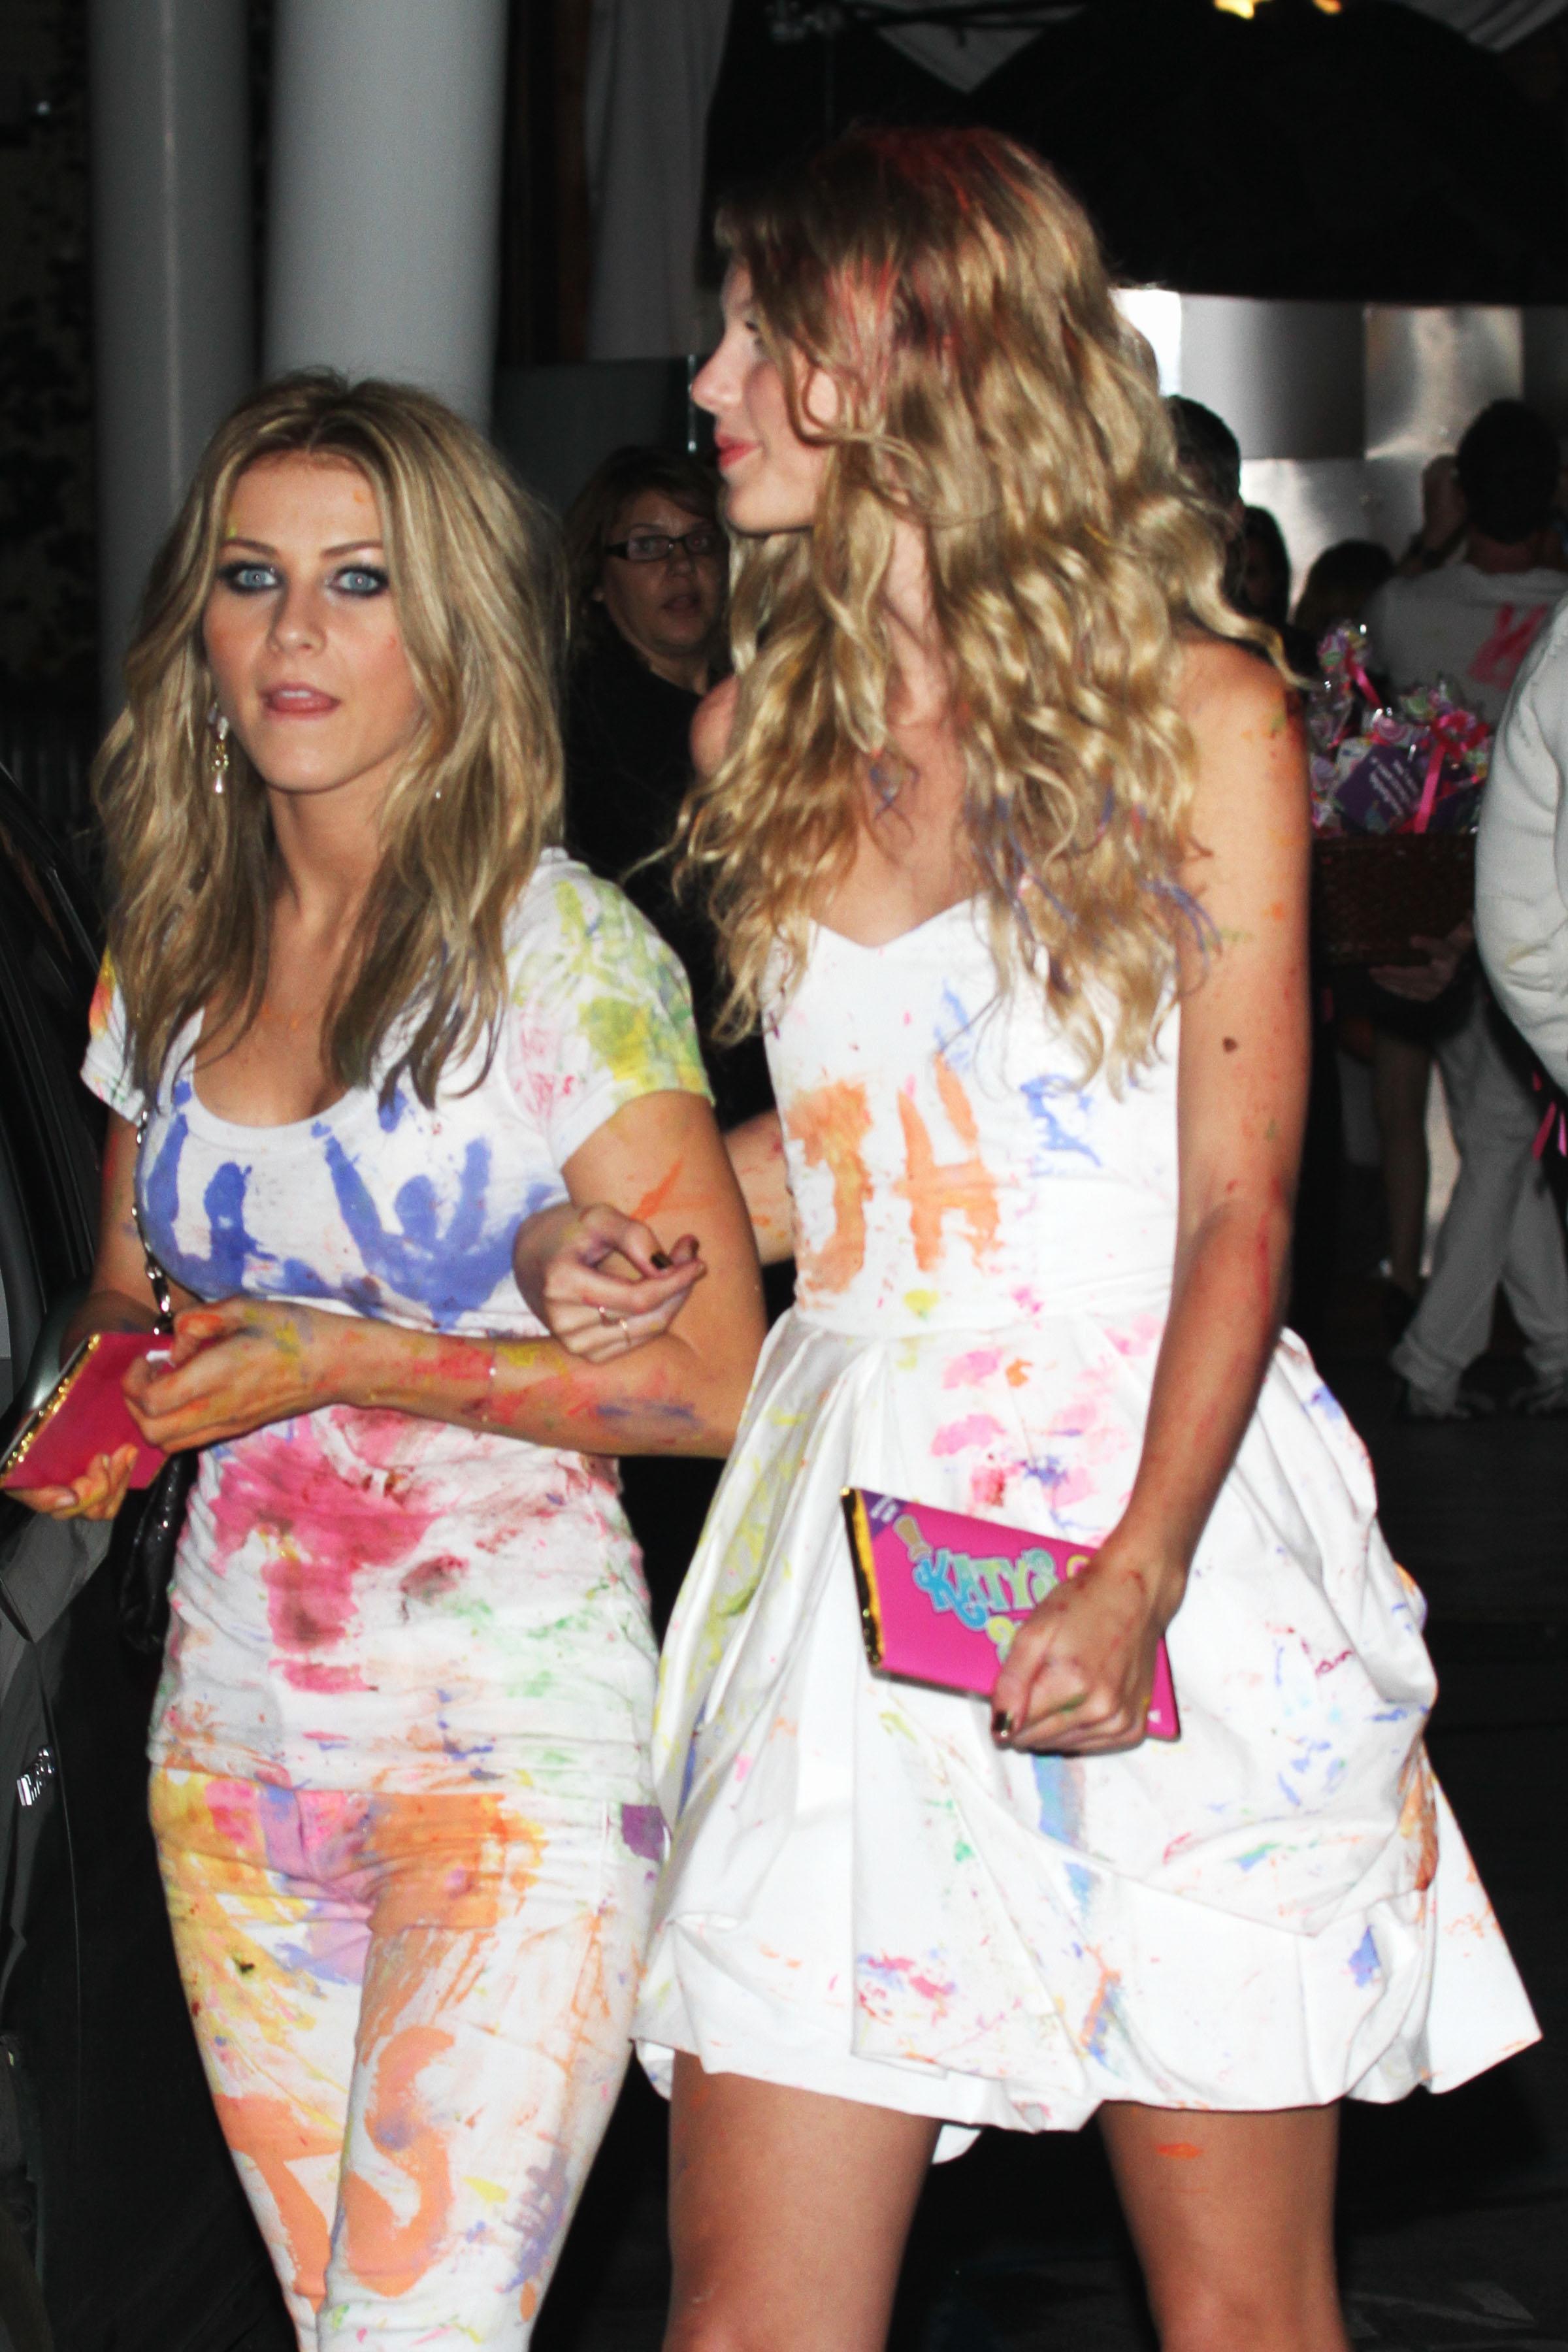 71816_Taylor_Swift_celebrates_Katy_Perrys_birthday_in_West_Hollywood-11_122_577lo.jpg